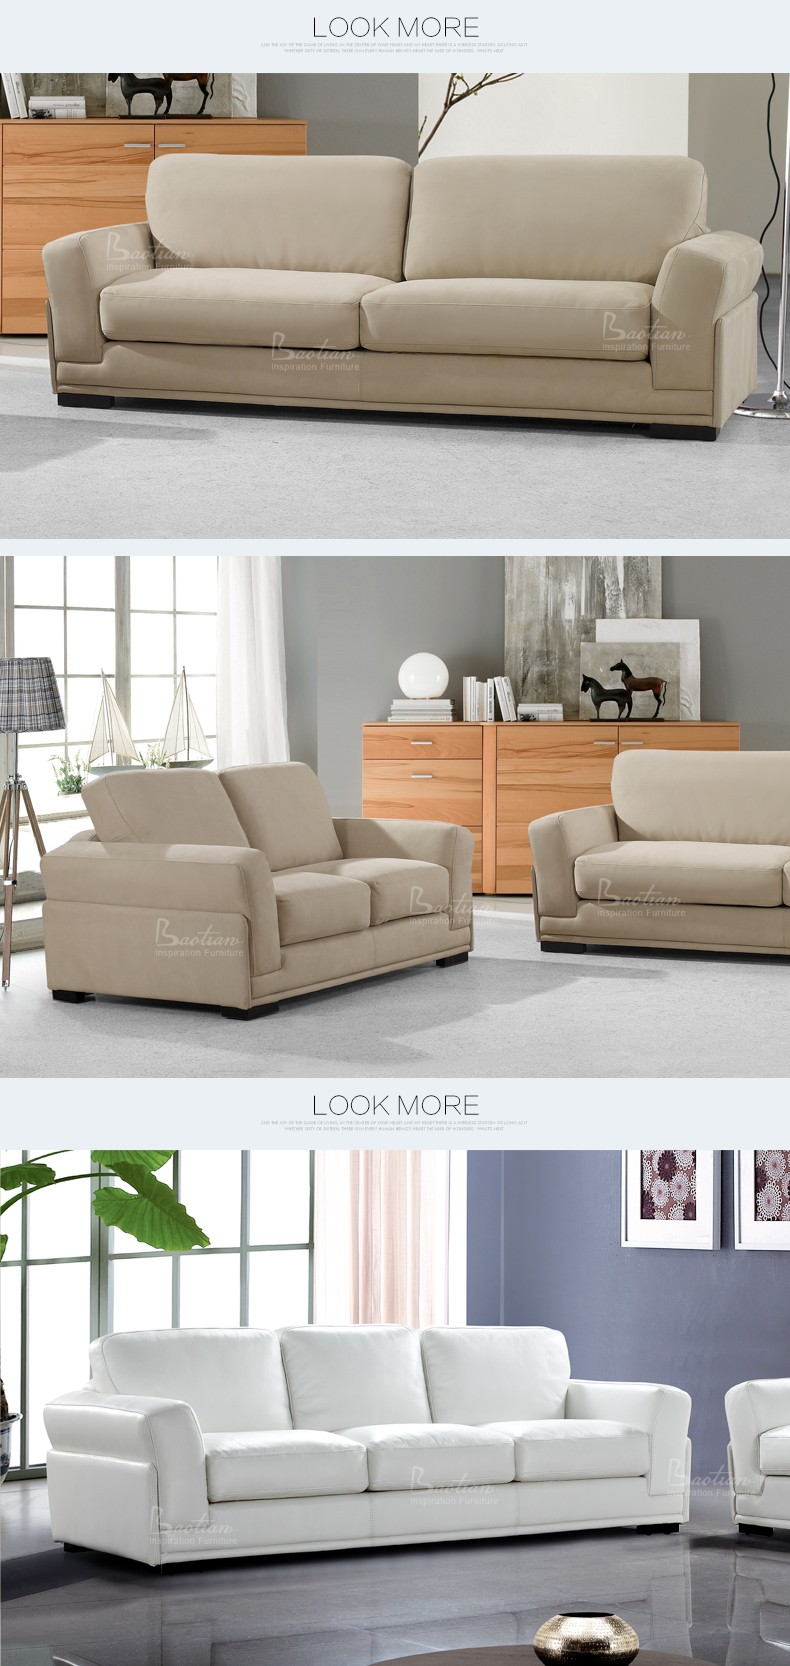 Modern italian leather sofa - Nicoletti Italian Leather Sofa European Style Modern Italian Full Leather Sofas